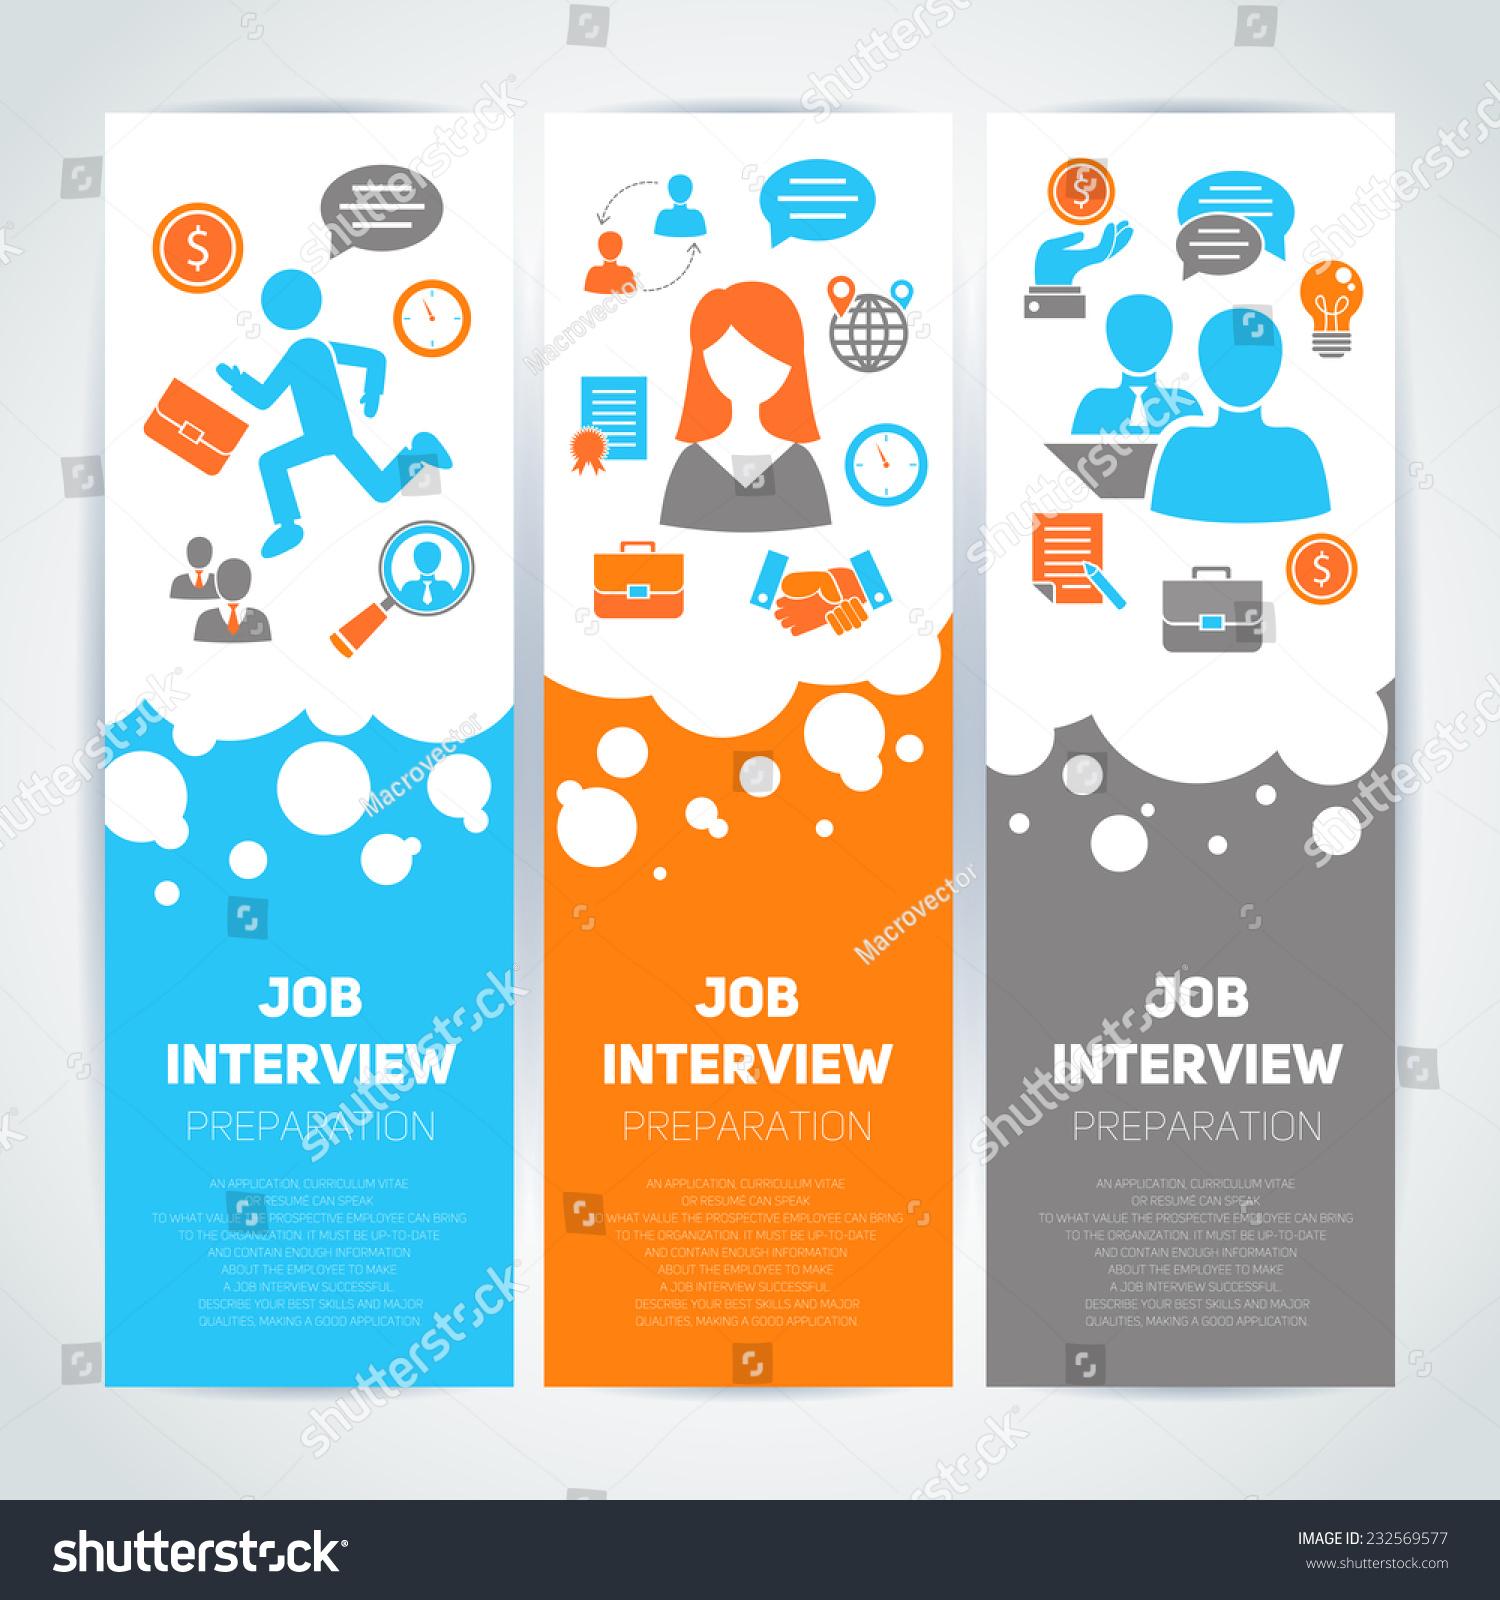 job interview preparation flat banner vertical stock vector job interview preparation flat banner vertical set recruitment meeting cv search isolated vector illustration